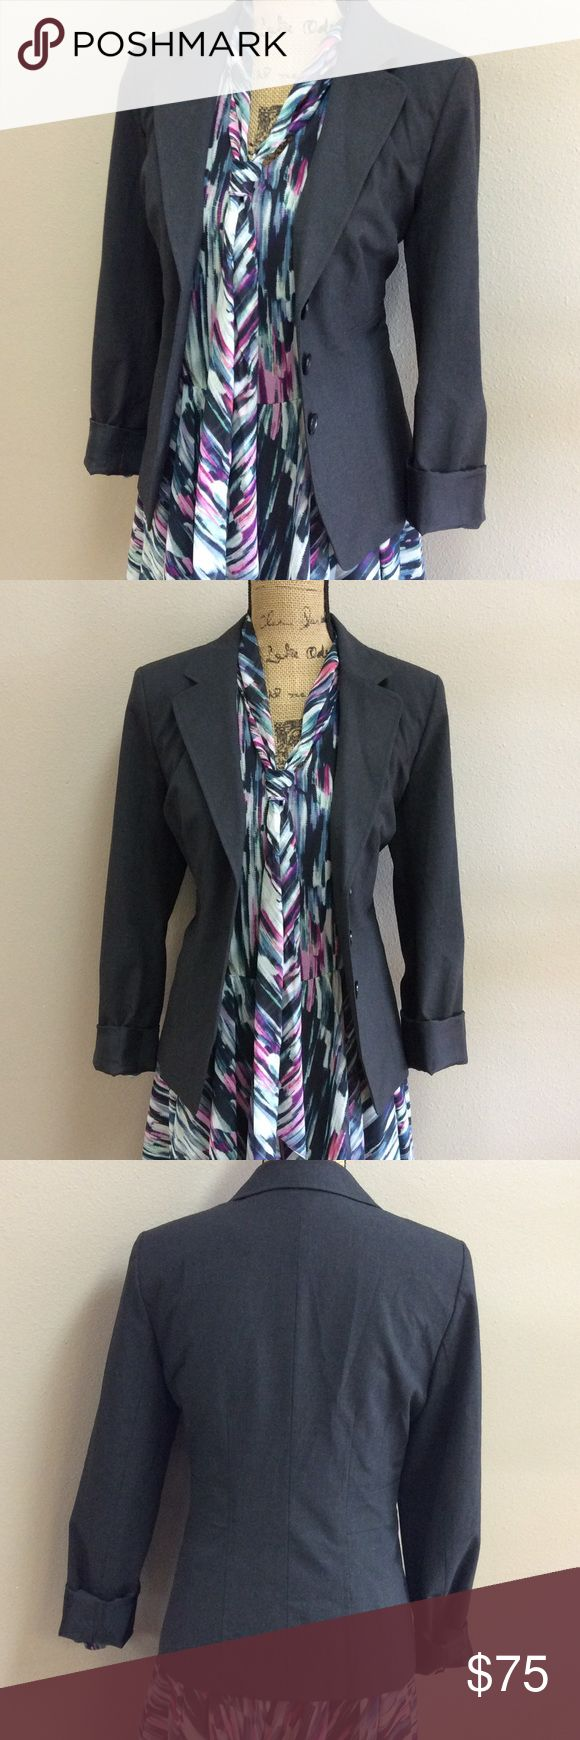 "HALOGEN Blazer Dimensions: shoulder to shoulder 16"", total length 24"". Material content 62% polyester, 33% viscose, 5% spandex. Lining 100% polyester. Dry clean only. Halogen Jackets & Coats"